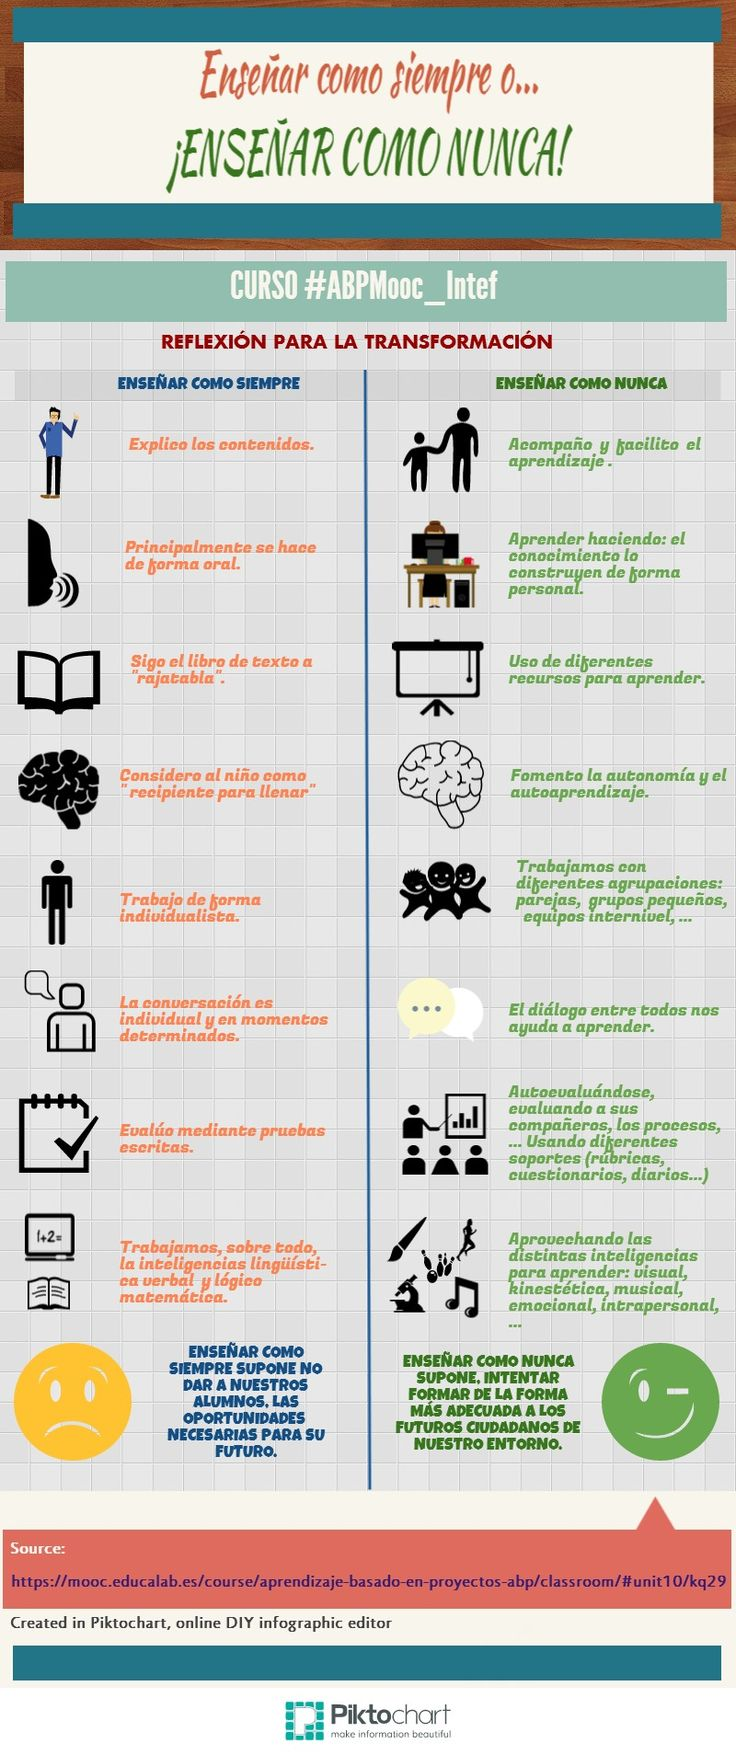 ENSEÑAR COMO SIEMPRE &ENSEÑAR COMO NUNCA #Formacion #Enseñanza #Educacion